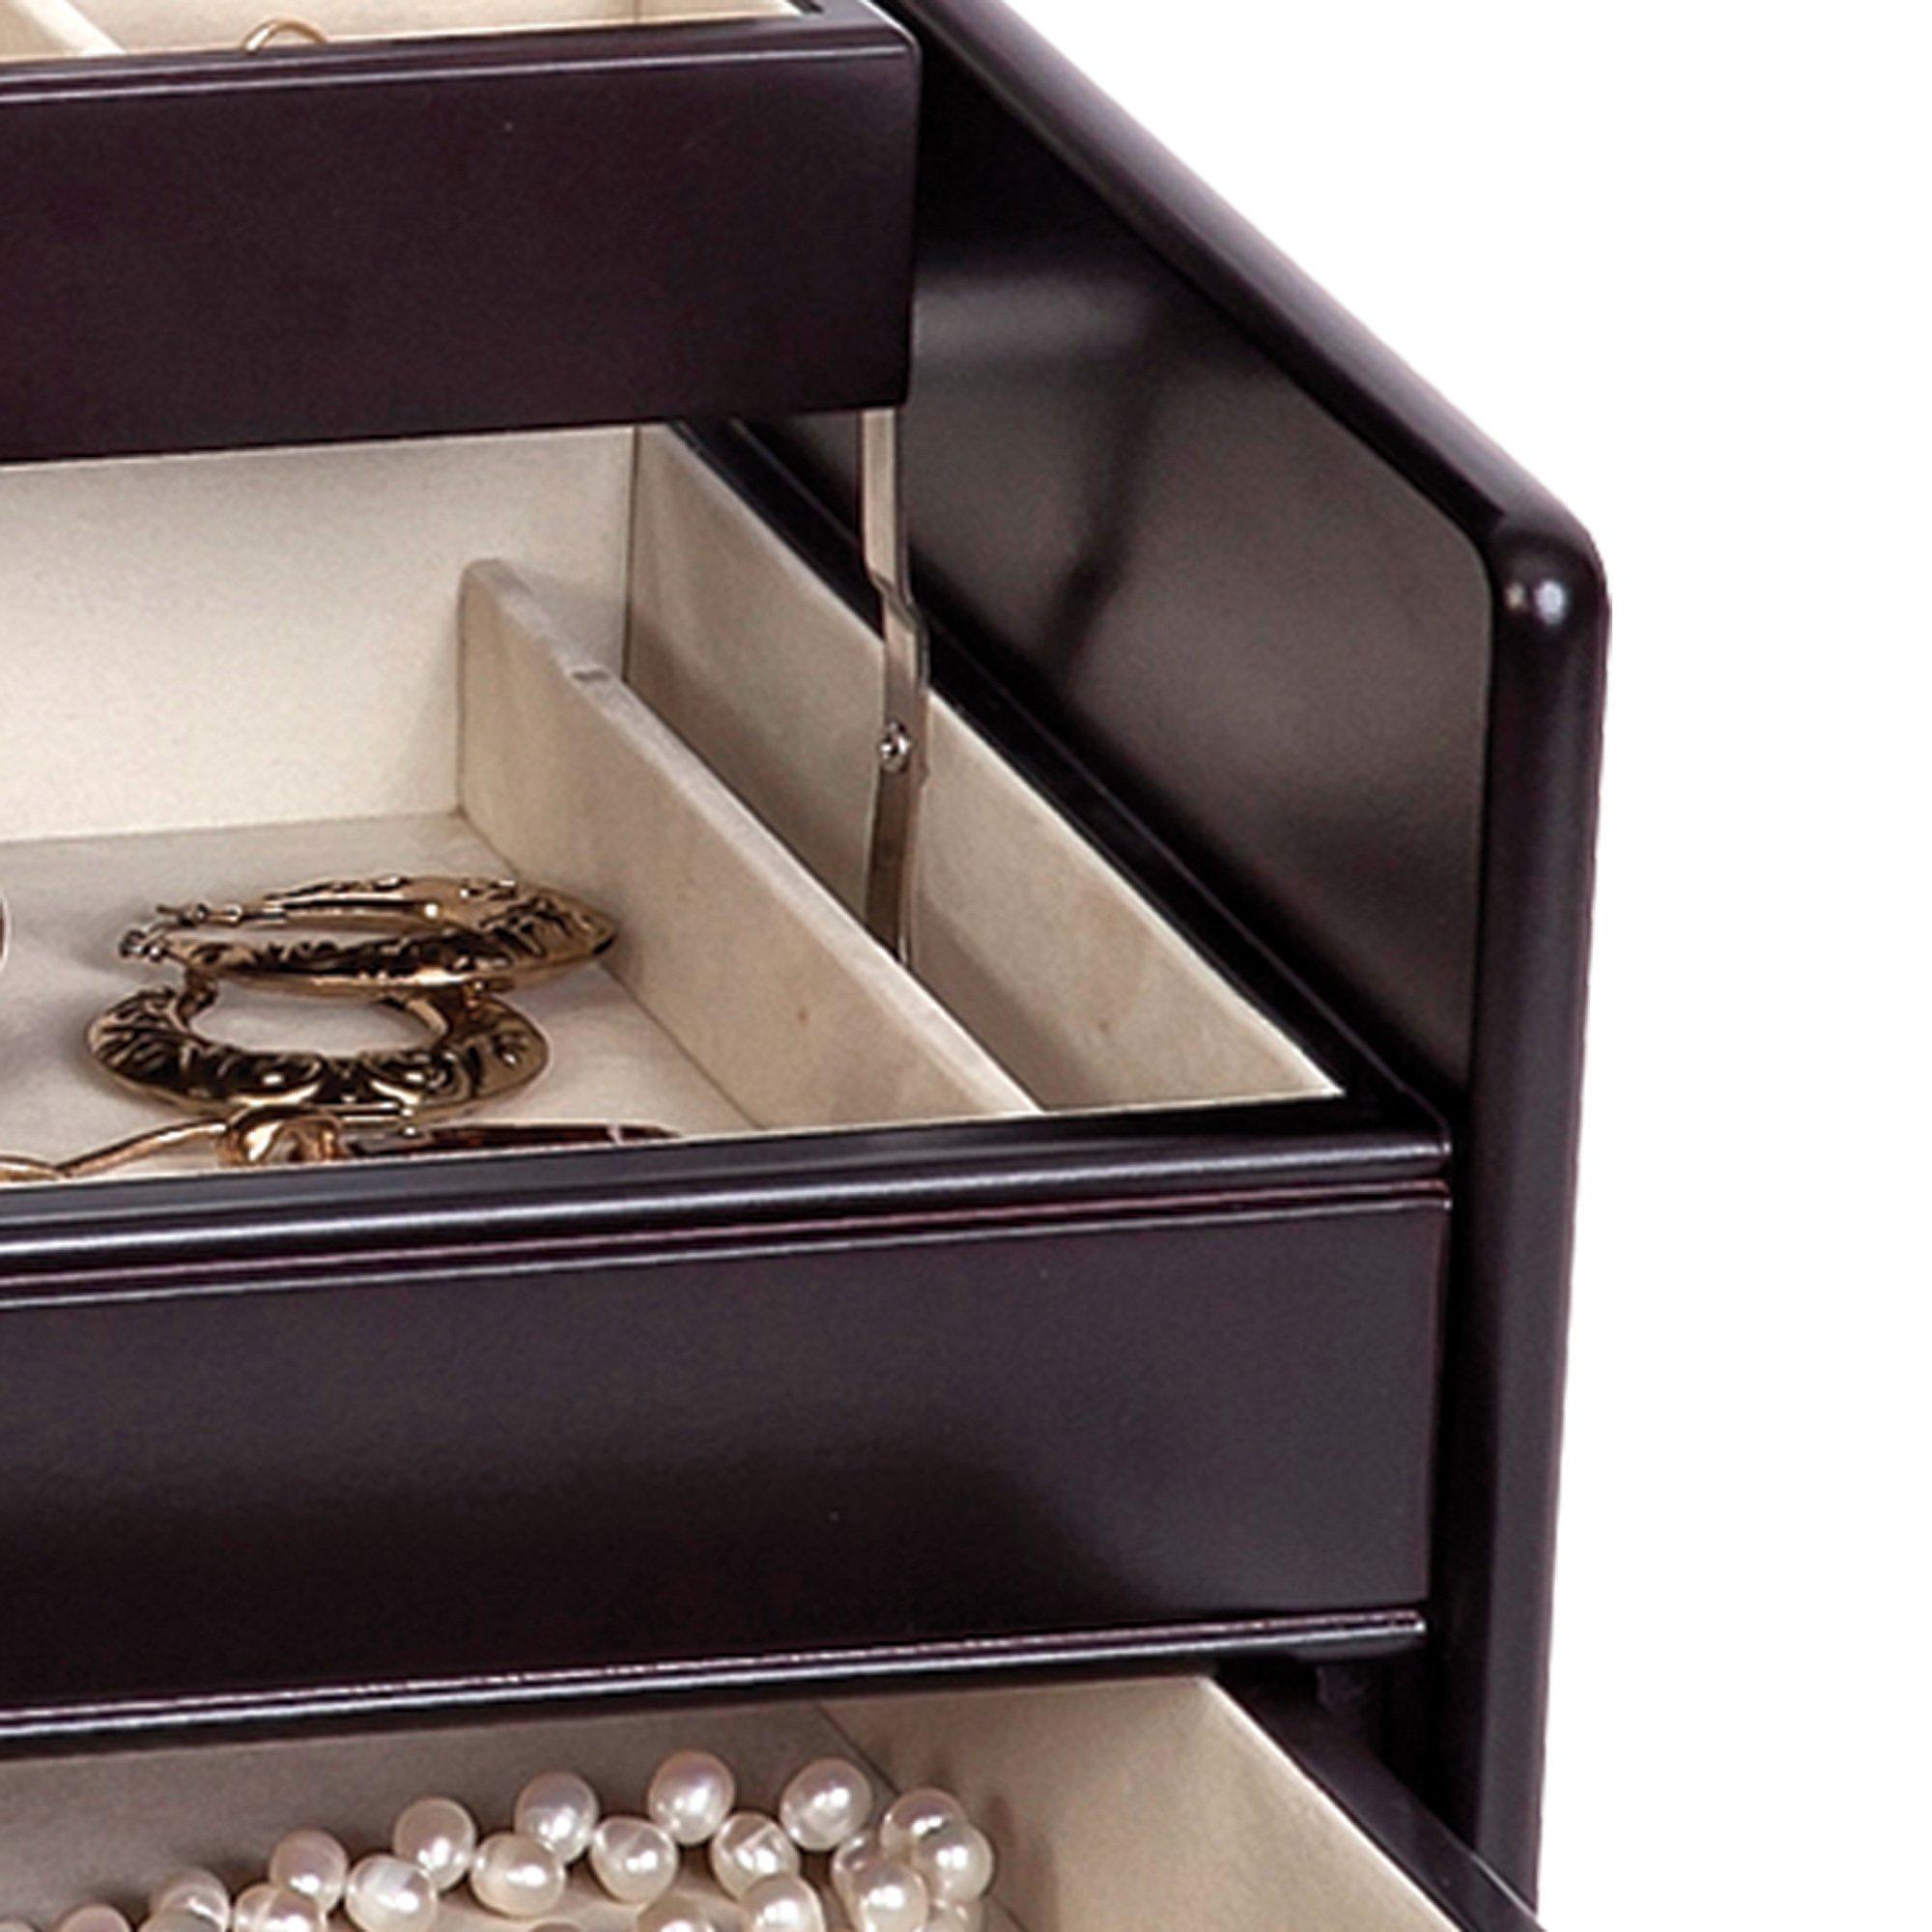 Mele & Co. Juliette Wooden Jewelry Box (Java Finish) by Mele & Co. (Image #7)